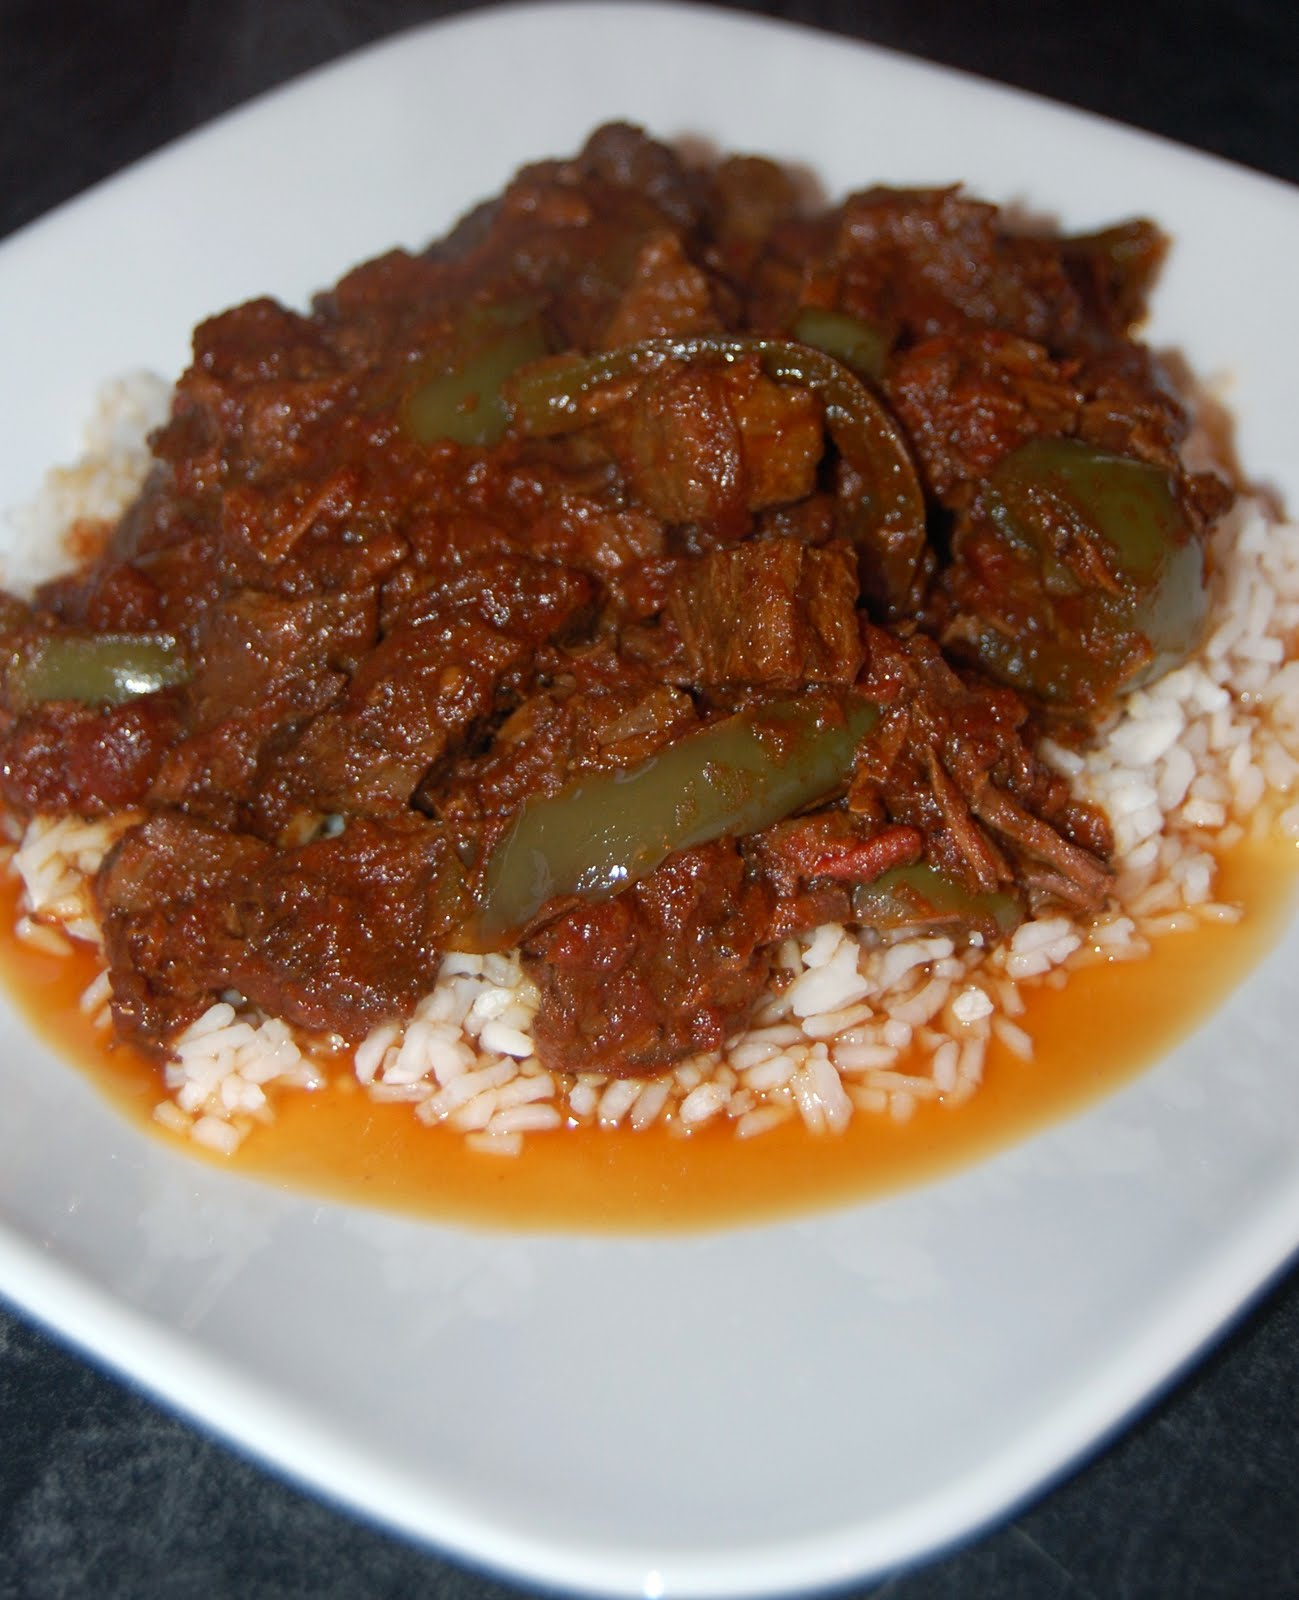 Peppercorn sauce recipes